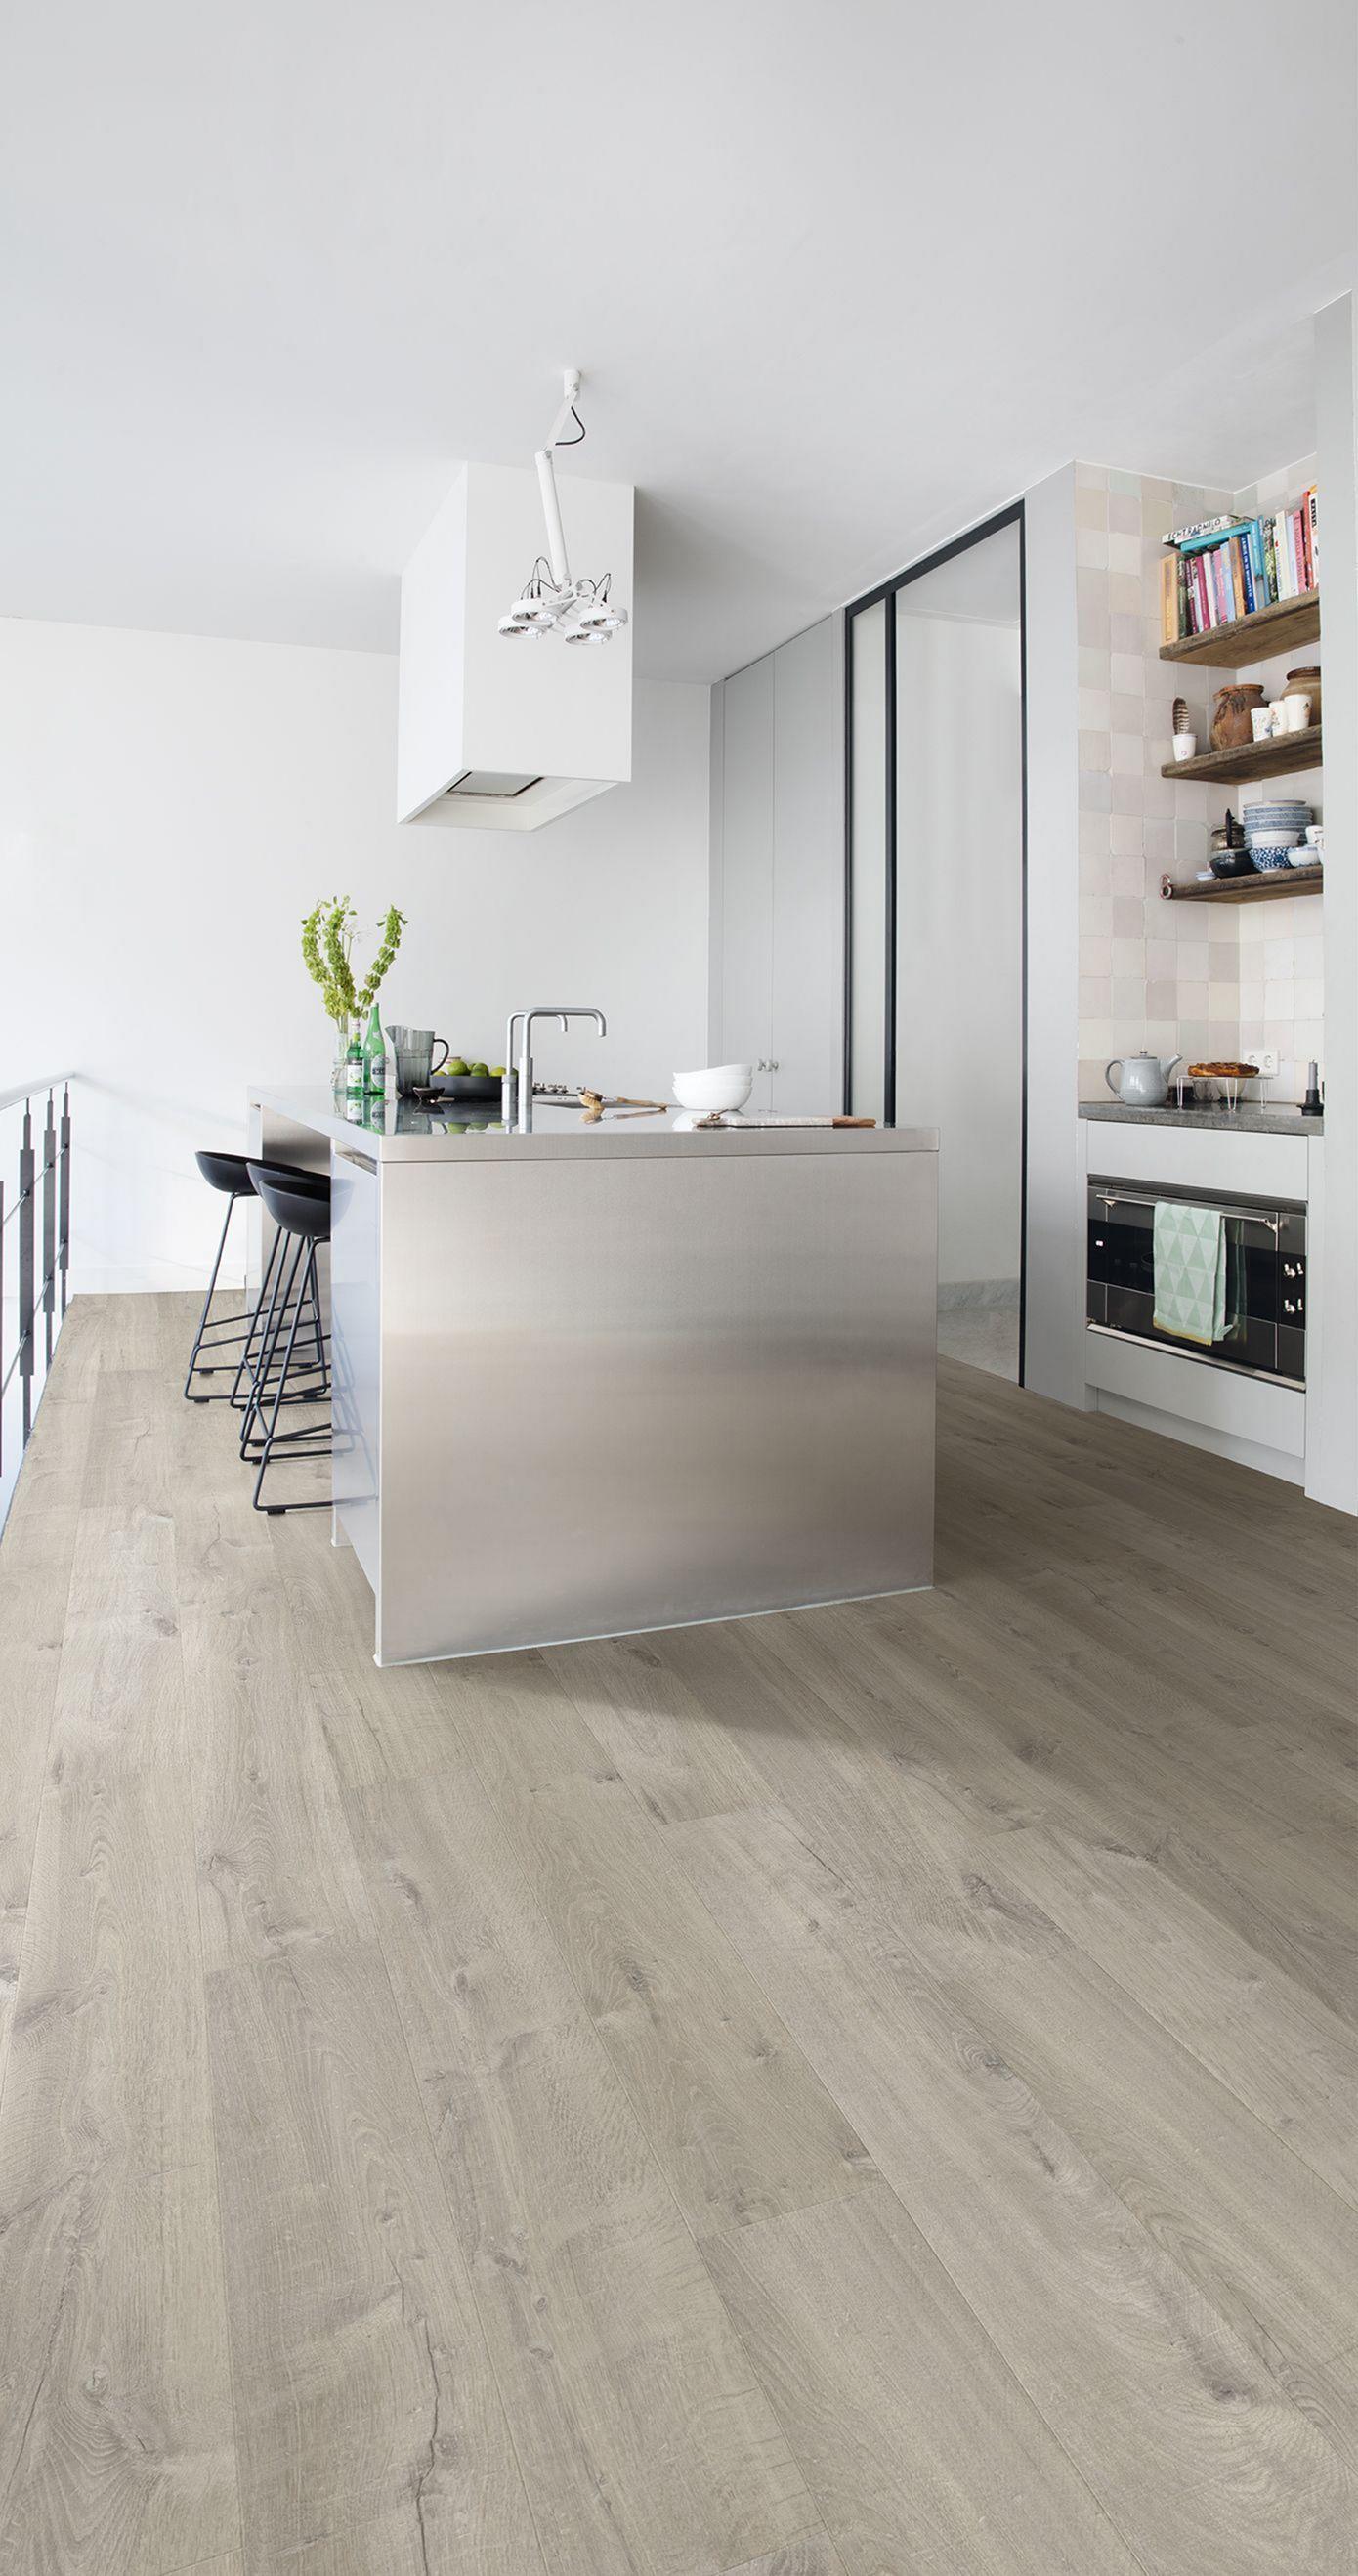 30 Spectacular Wood Floor Ideas For Amazing Kitchen Best